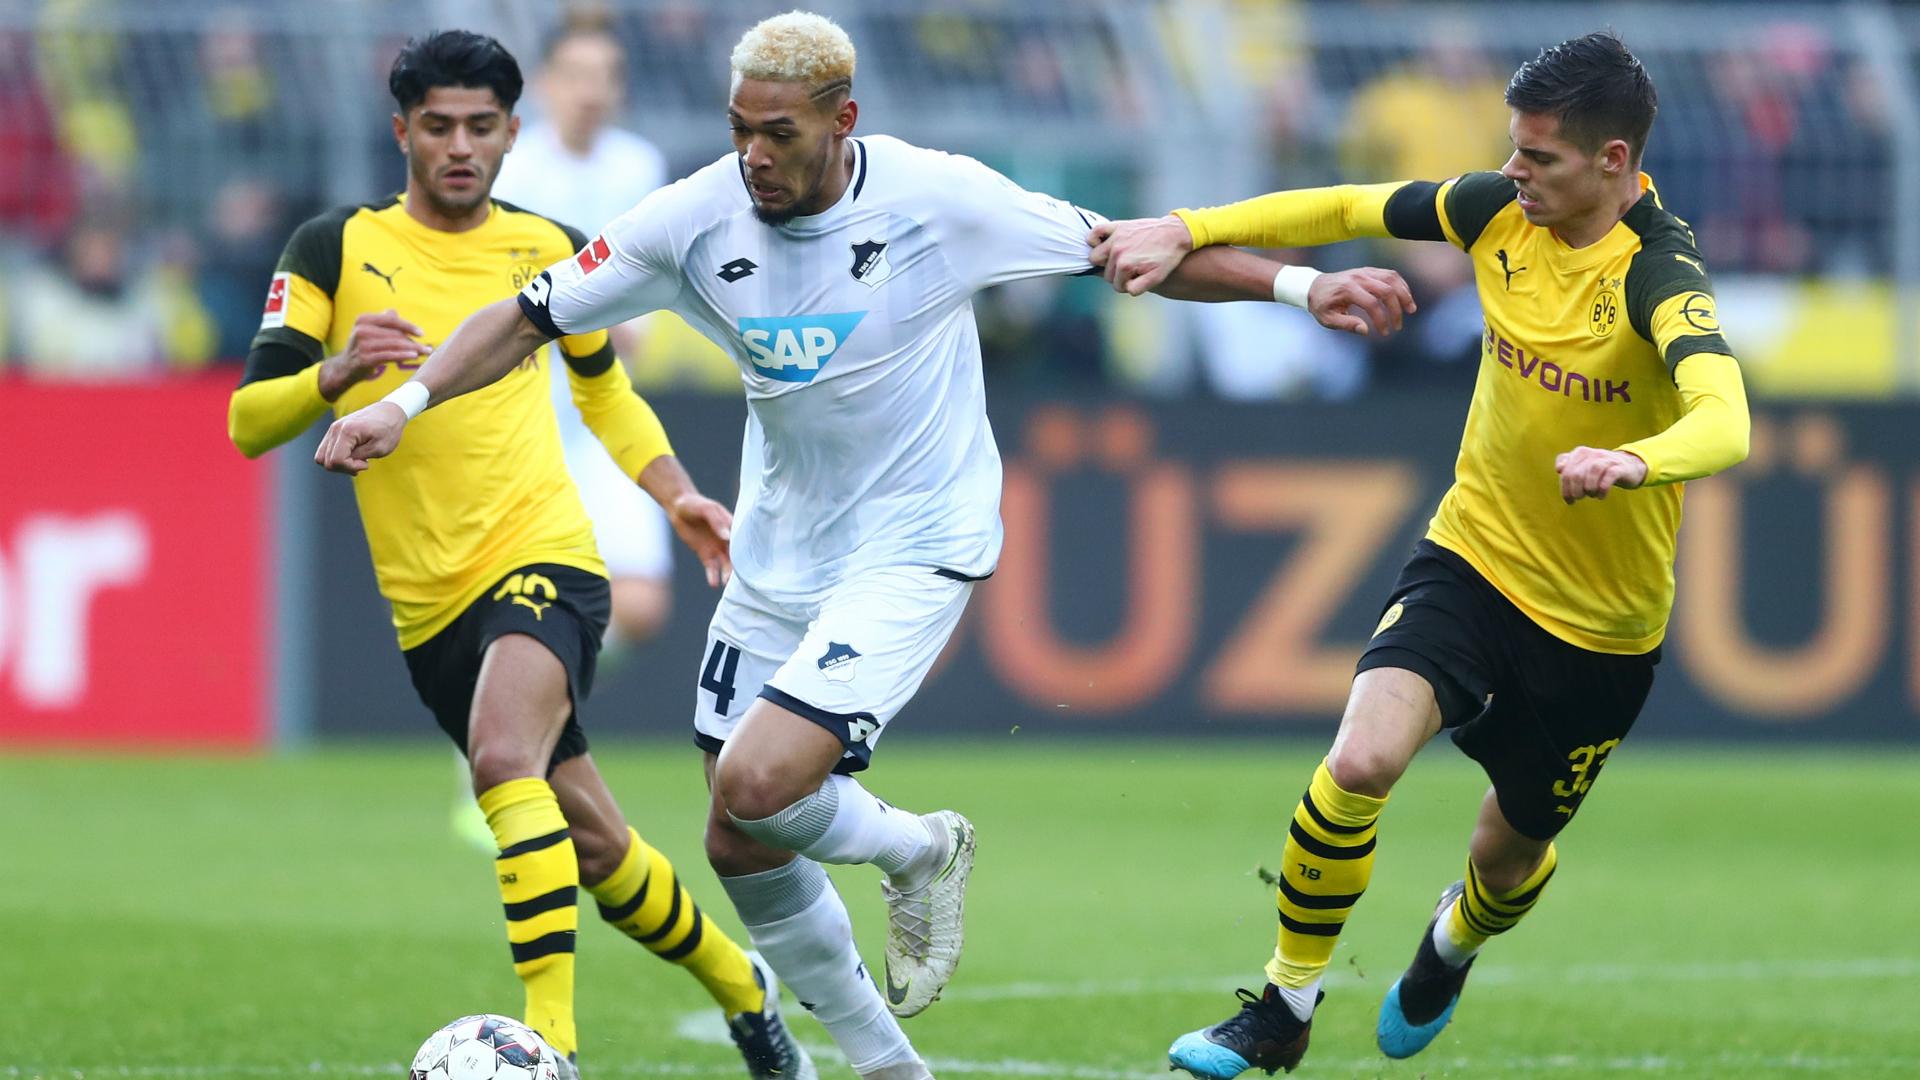 Borussia Dortmund 3 Hoffenheim 3: Sensational three-goal comeback denies Favre's men